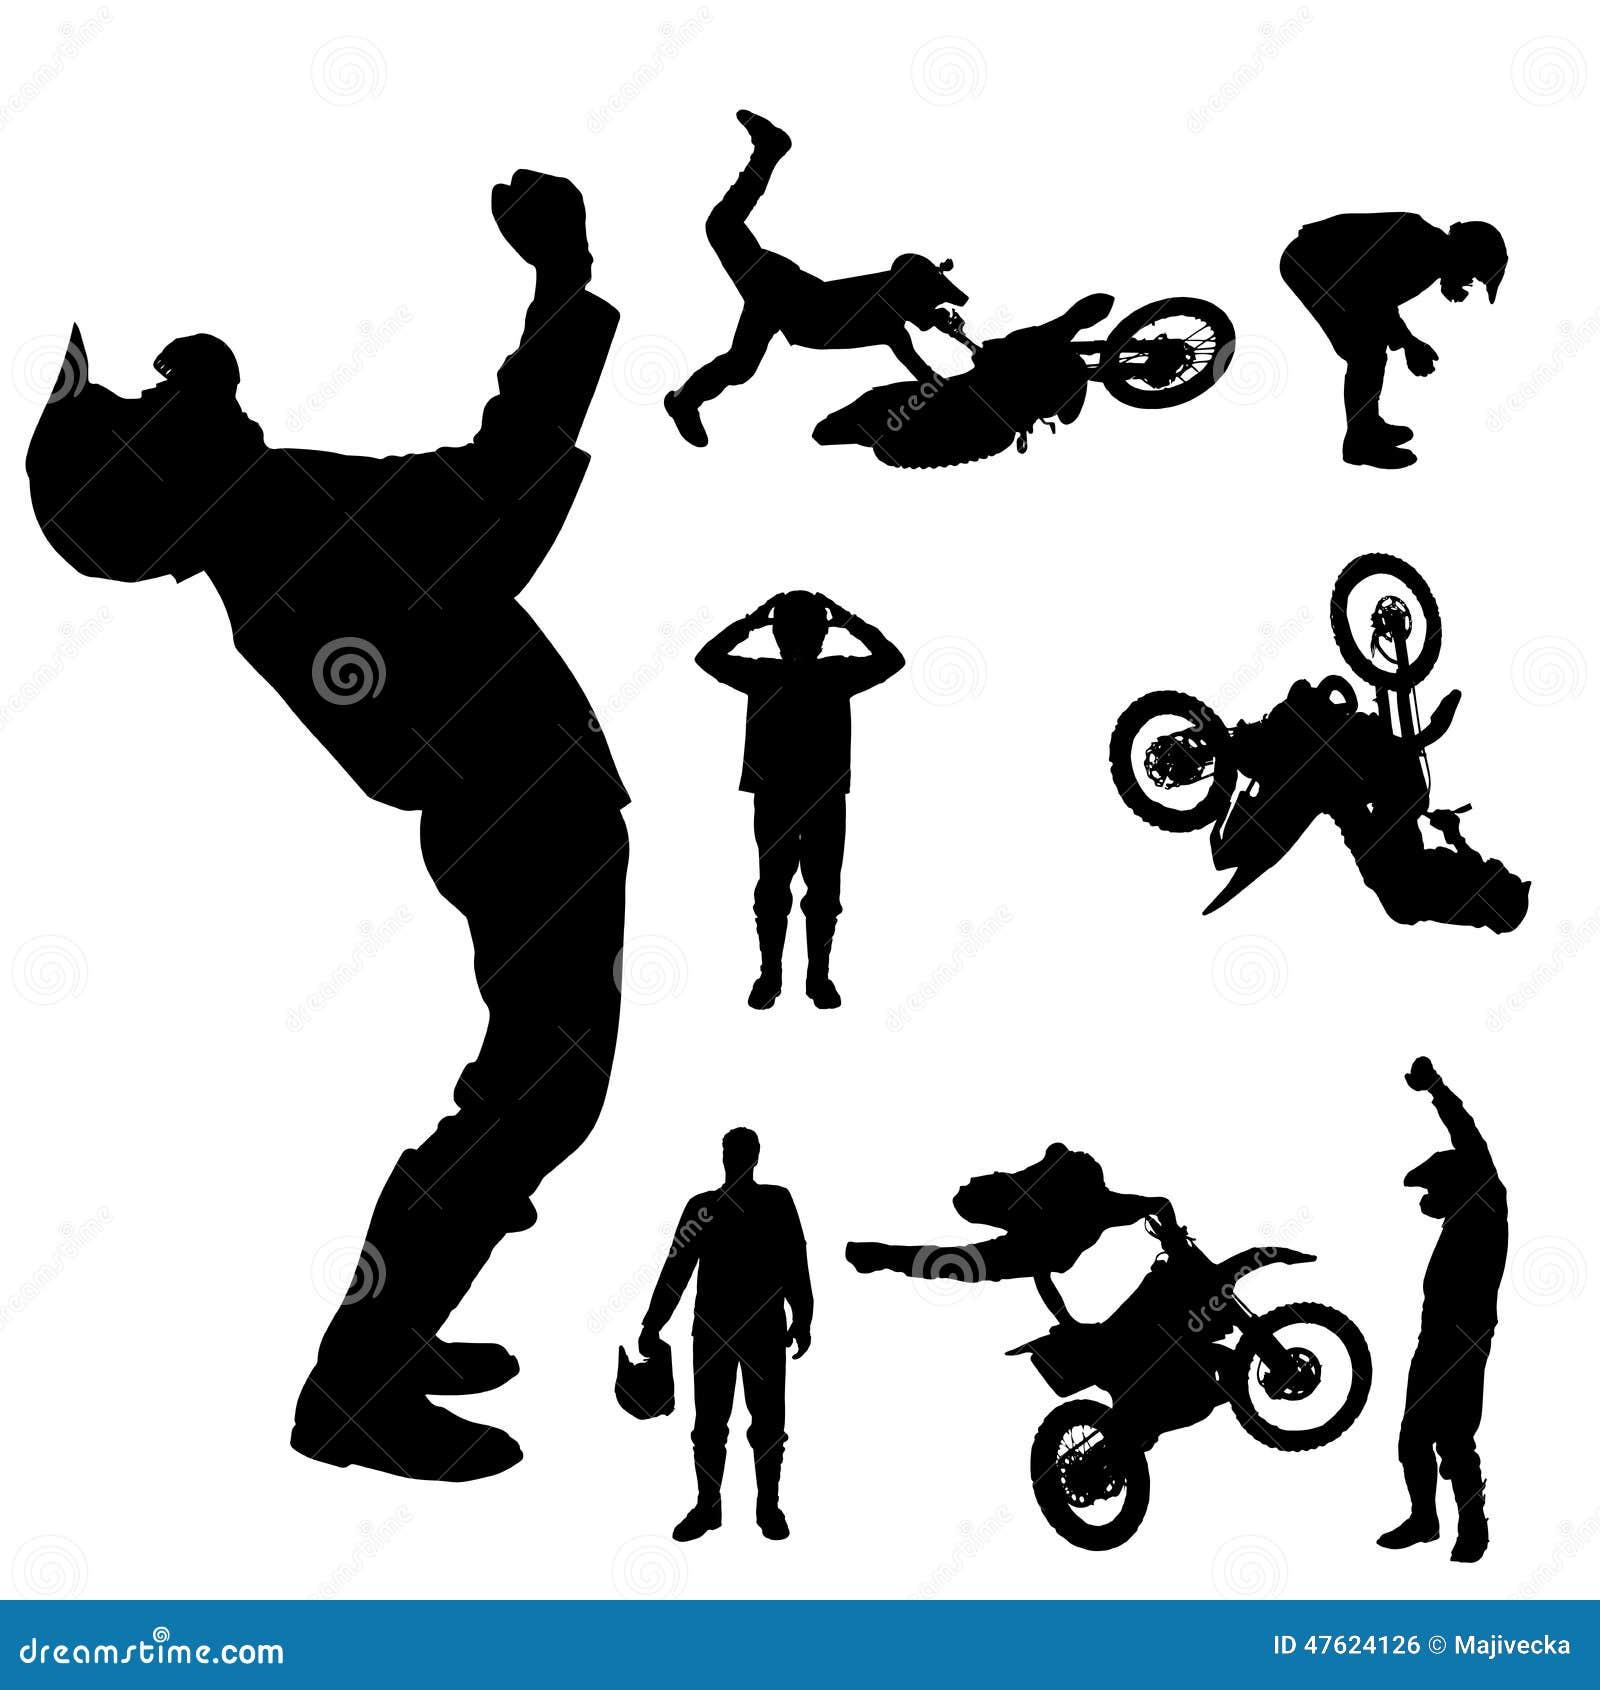 Dirtbike Sport Silhouettes  Download Free Vectors